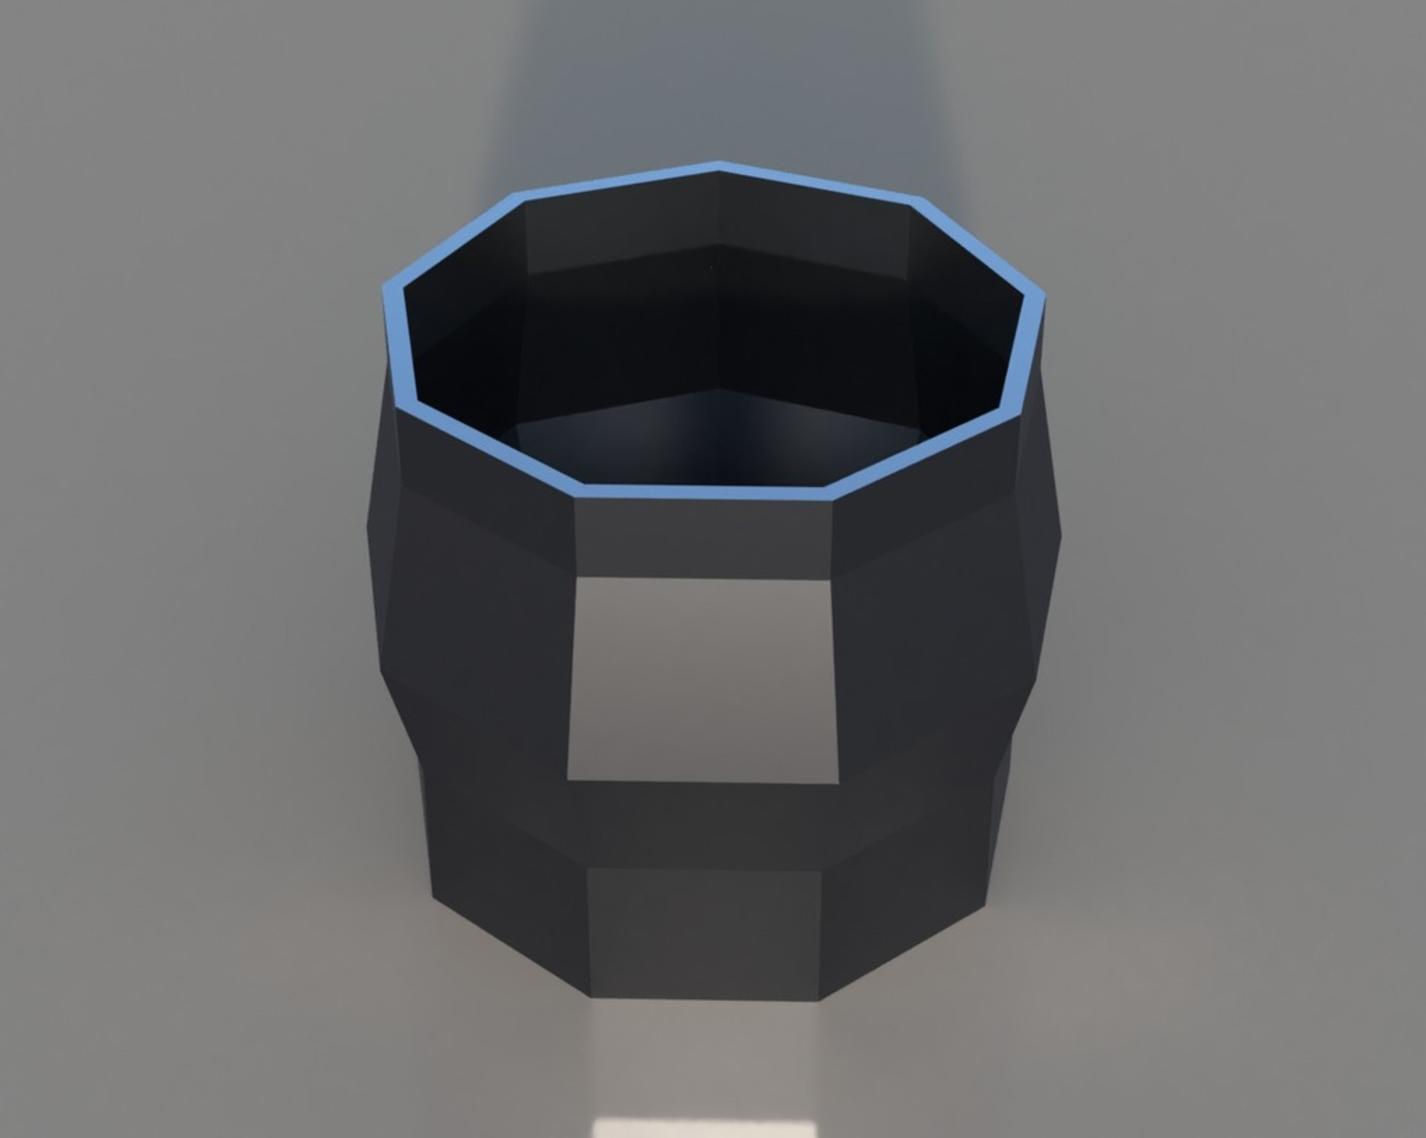 Capture d'écran 2017-09-13 à 10.35.26.png Download free STL file Geometric Vase • 3D printable object, 3DPrintingGurus